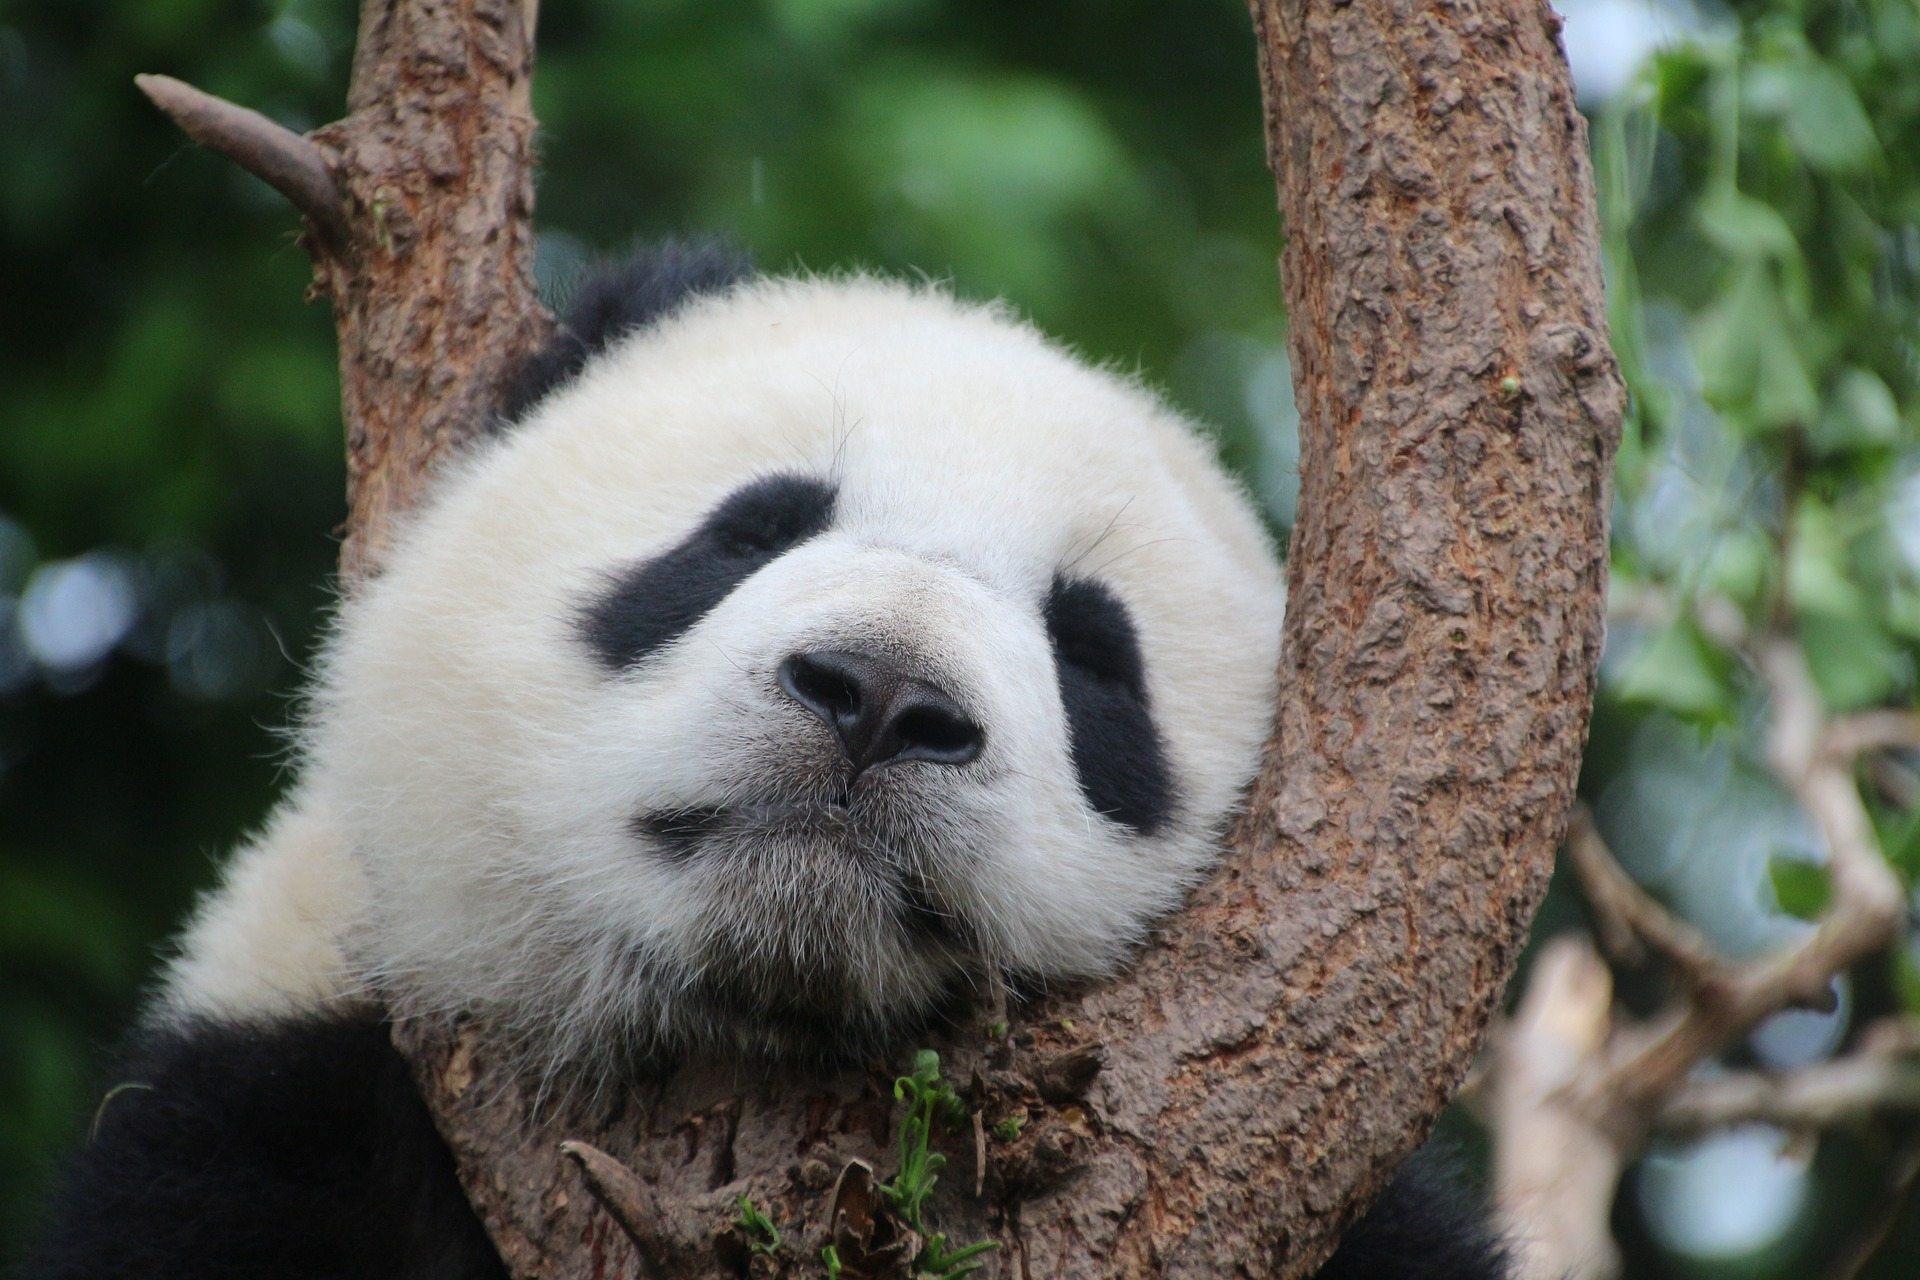 Pandas should be saved